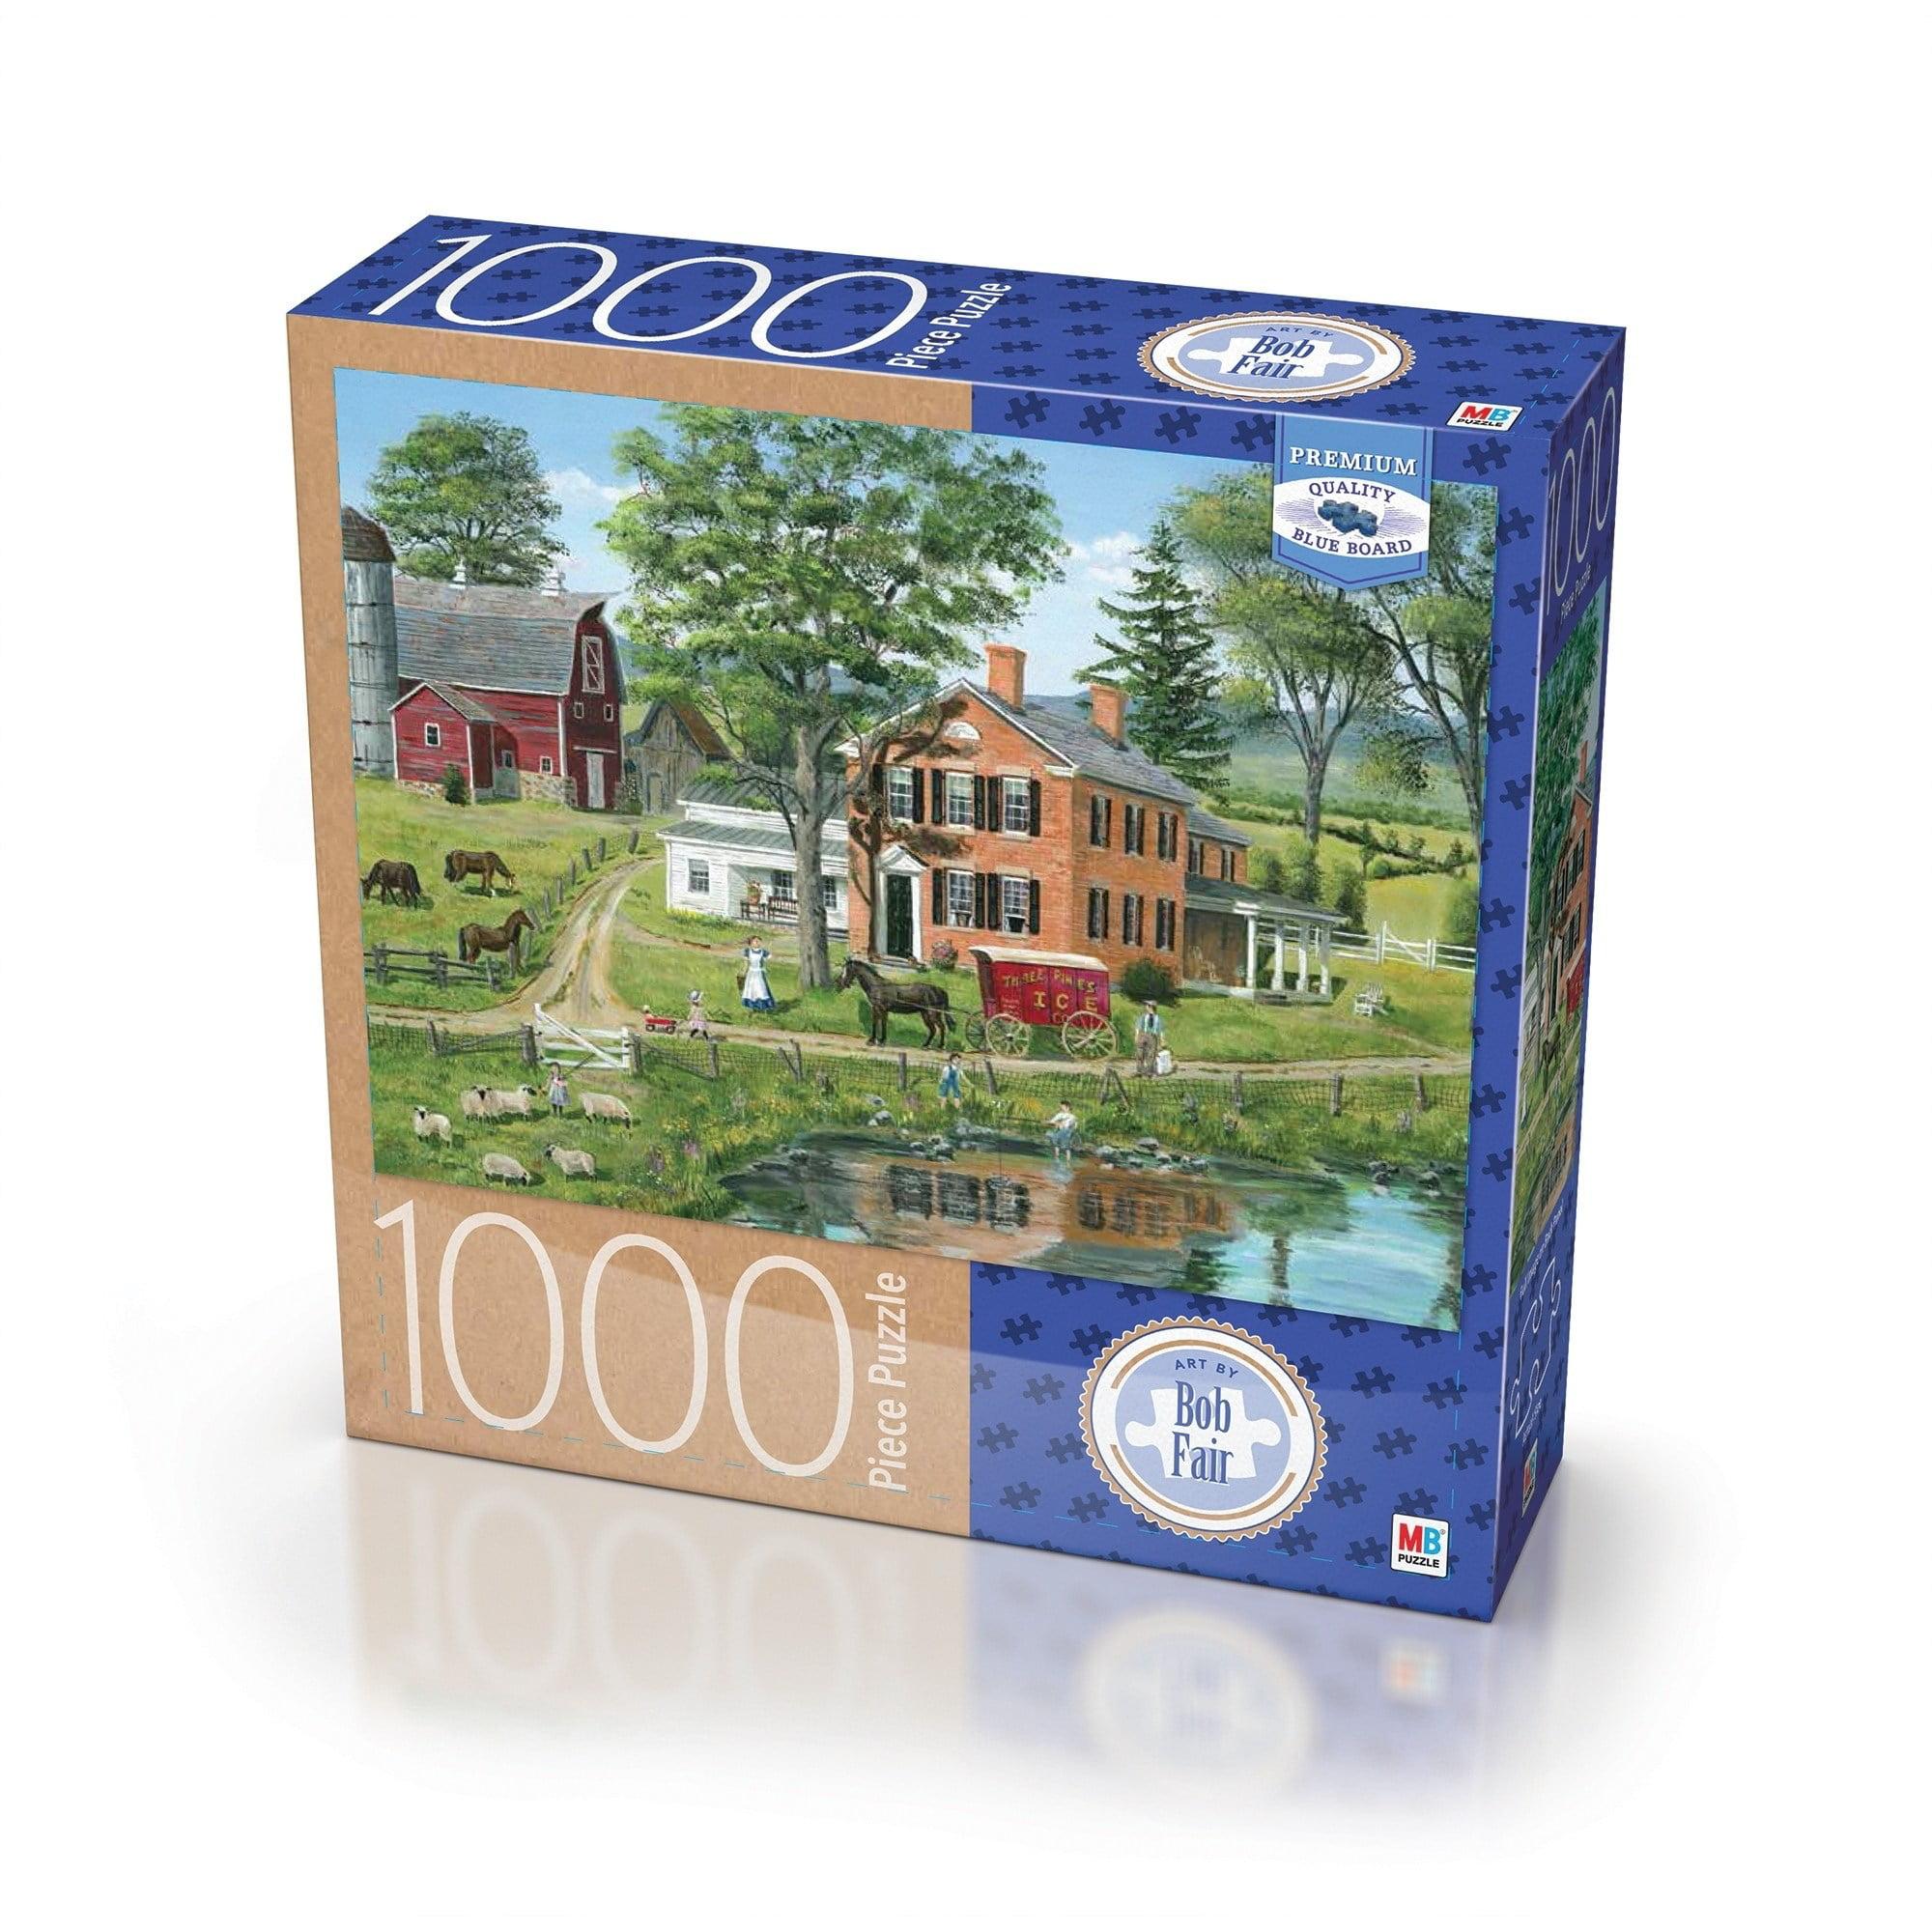 Milton Bradley Premium Blue Board Jigsaw Puzzle Bob Fair Ice Delivery: 1000 Pcs by Milton Bradley